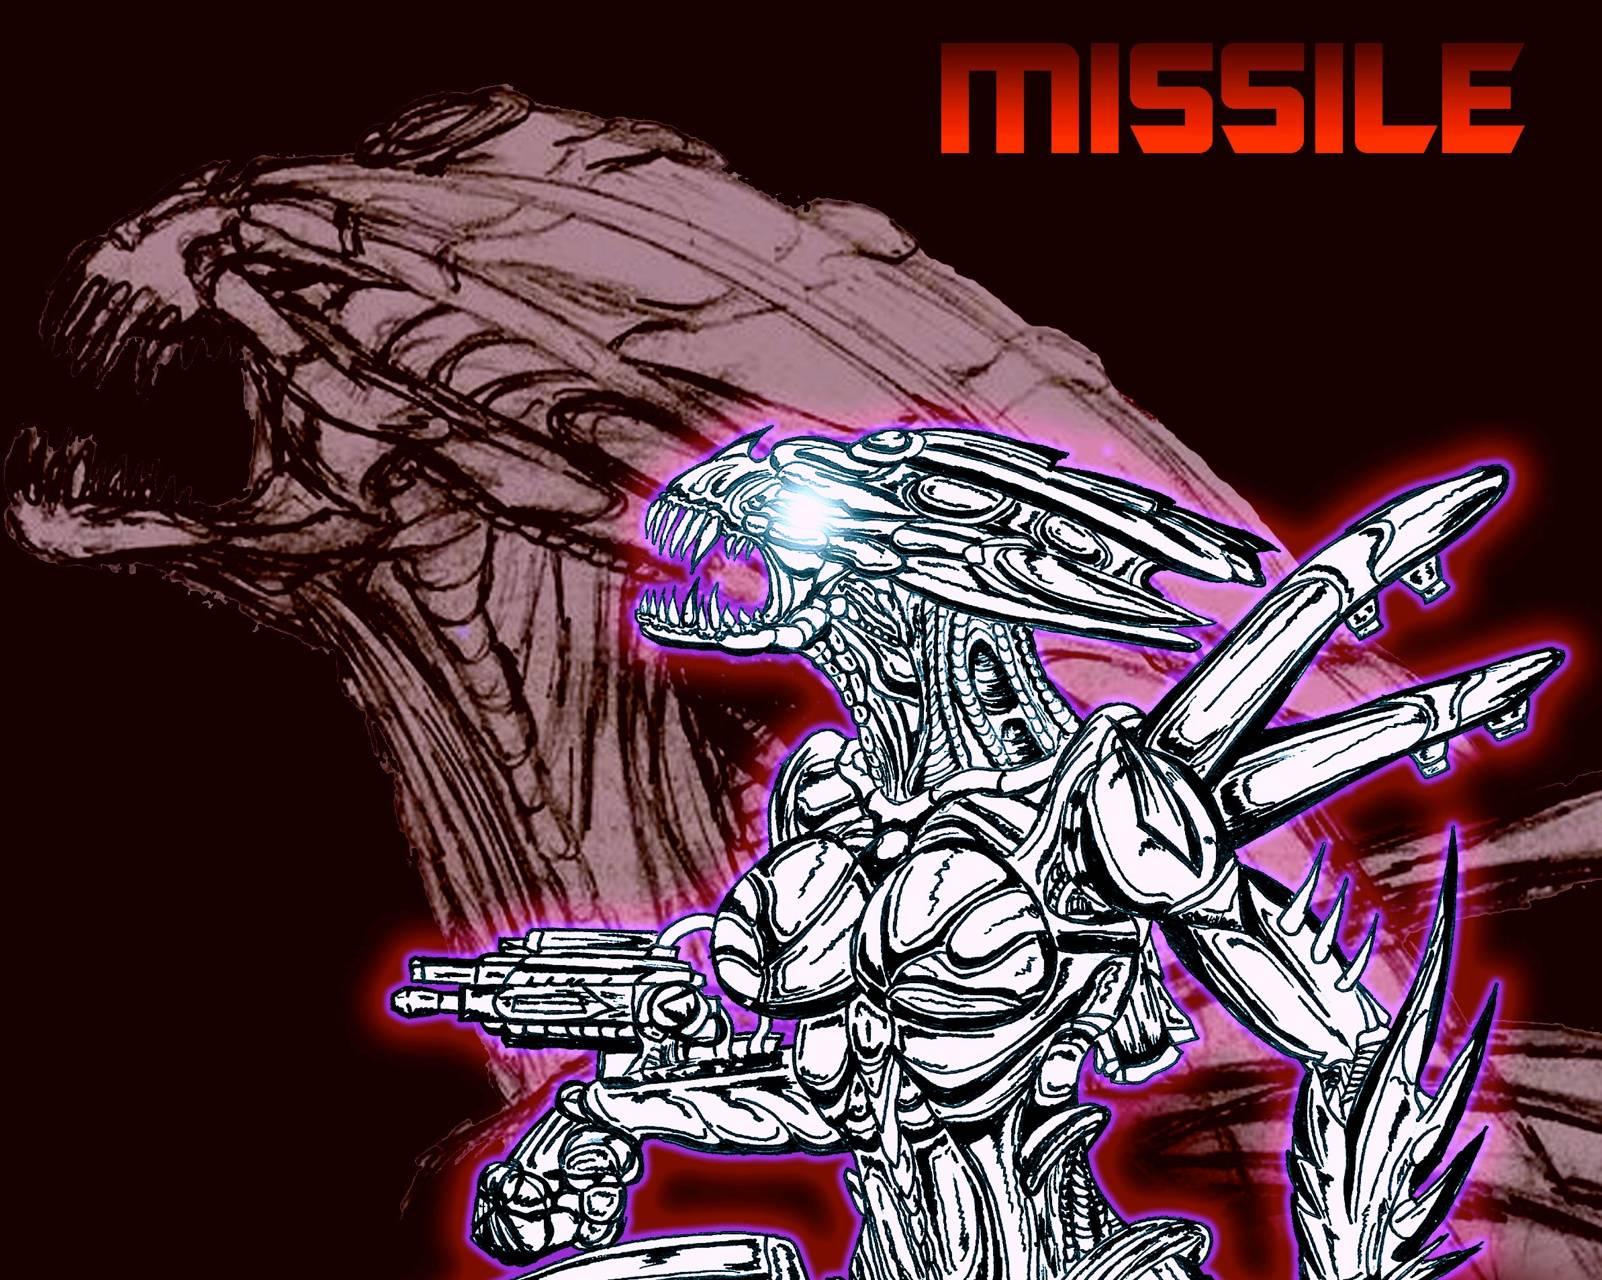 Missile Lady Mechtis